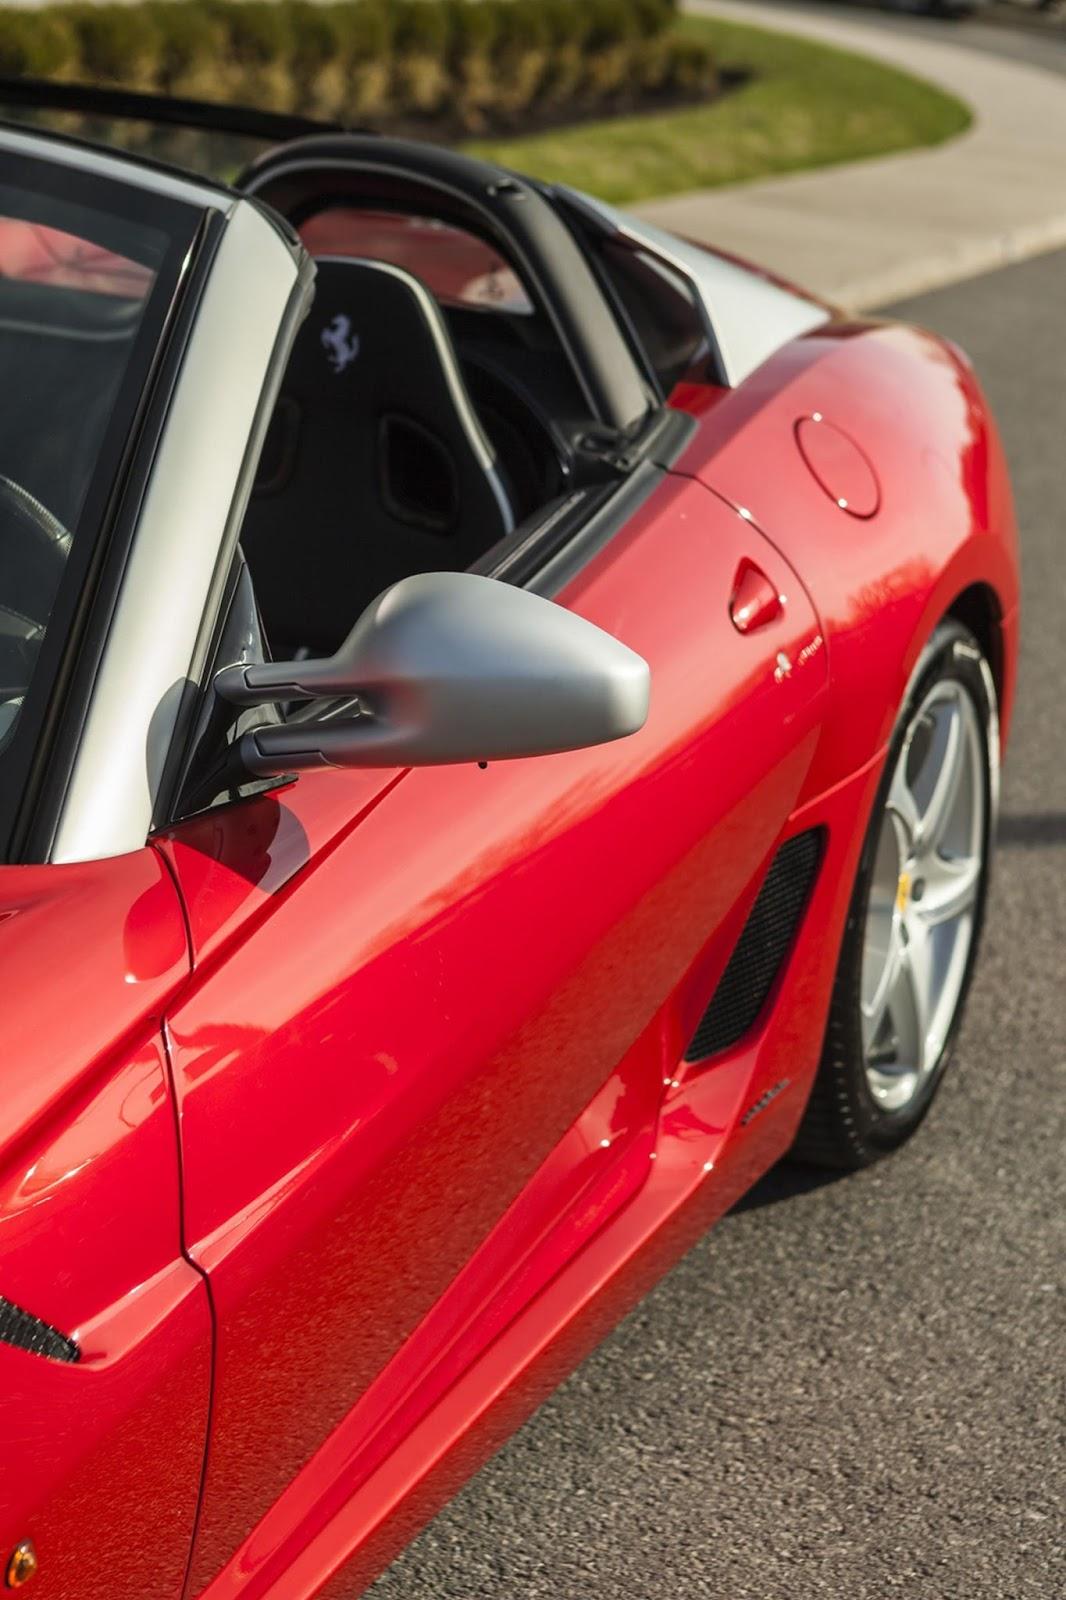 Ferrari-599-SA-Aperta-For-Sale-8